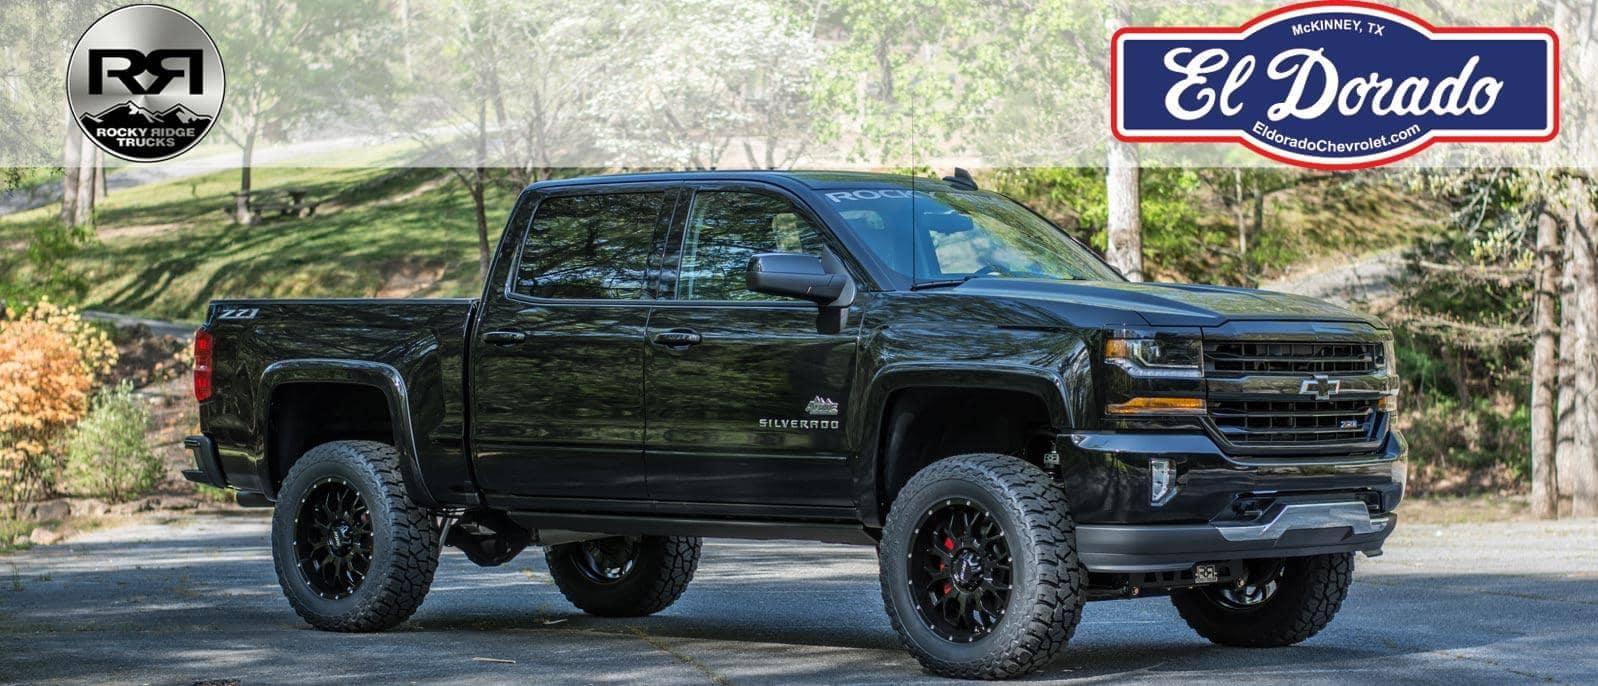 Rocky Ridge Trucks El Dorado Chevrolet